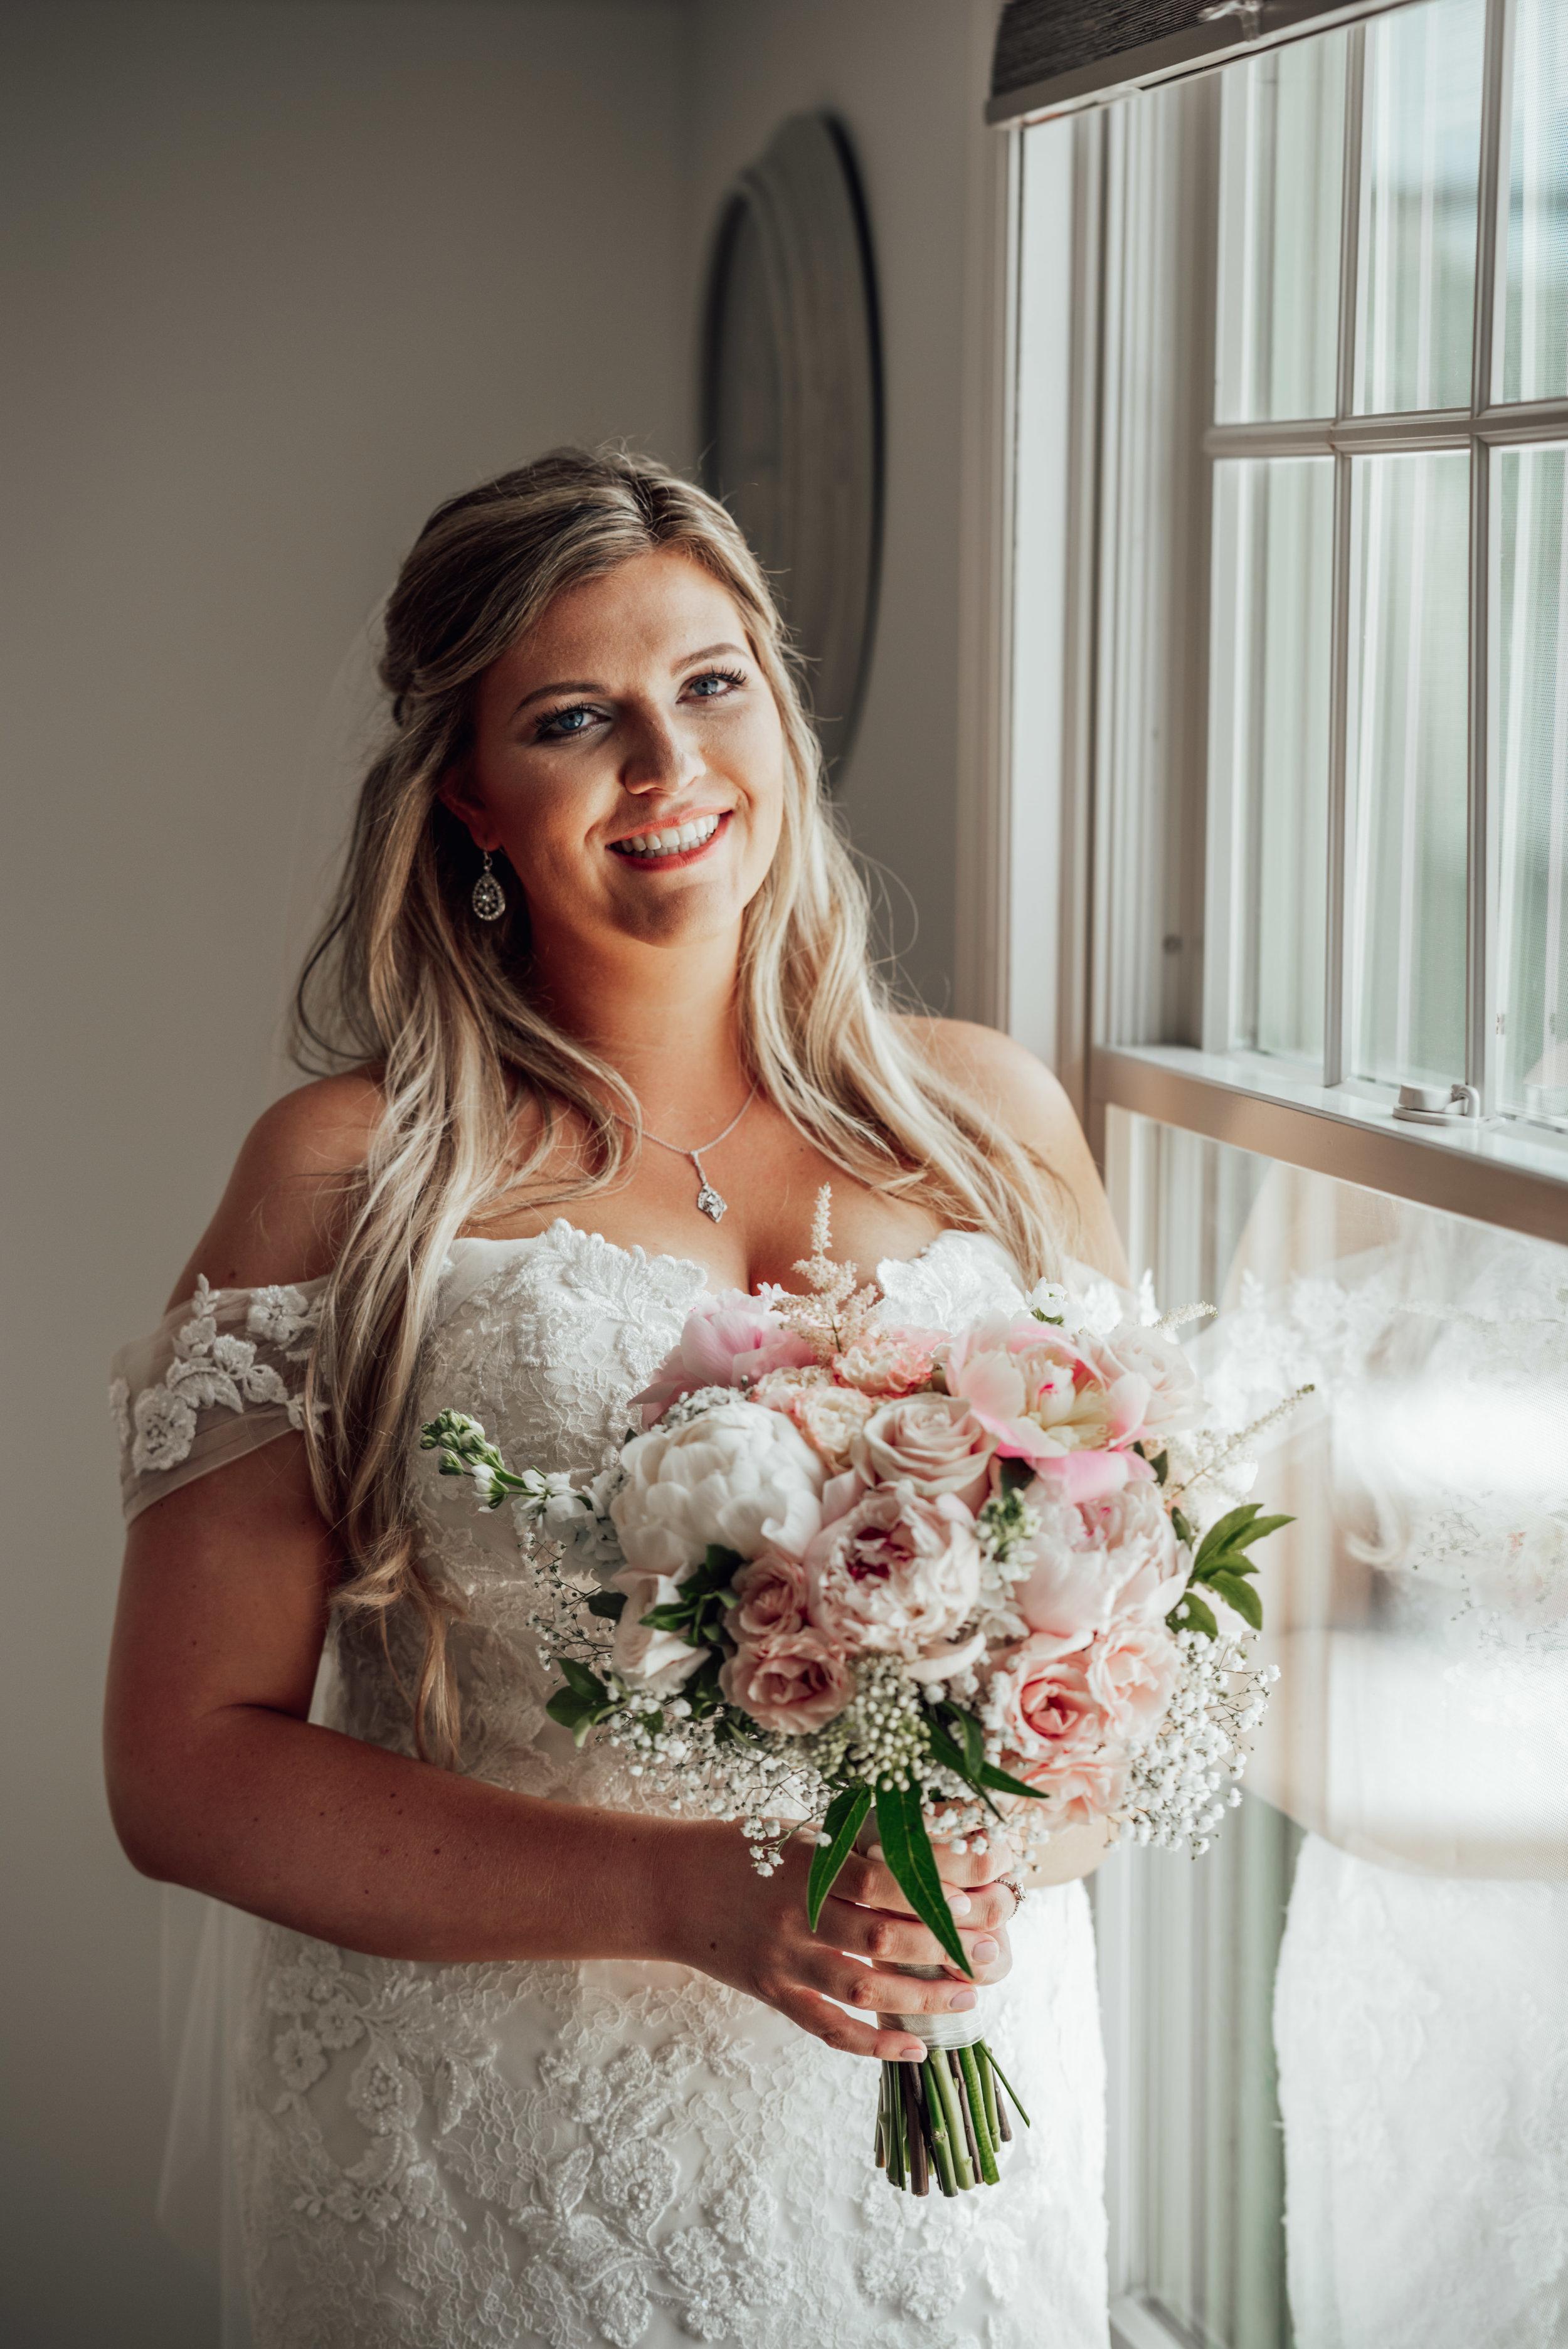 New Jersey Wedding Photographer, Felsberg Photography LBI wedding photography 39.jpg